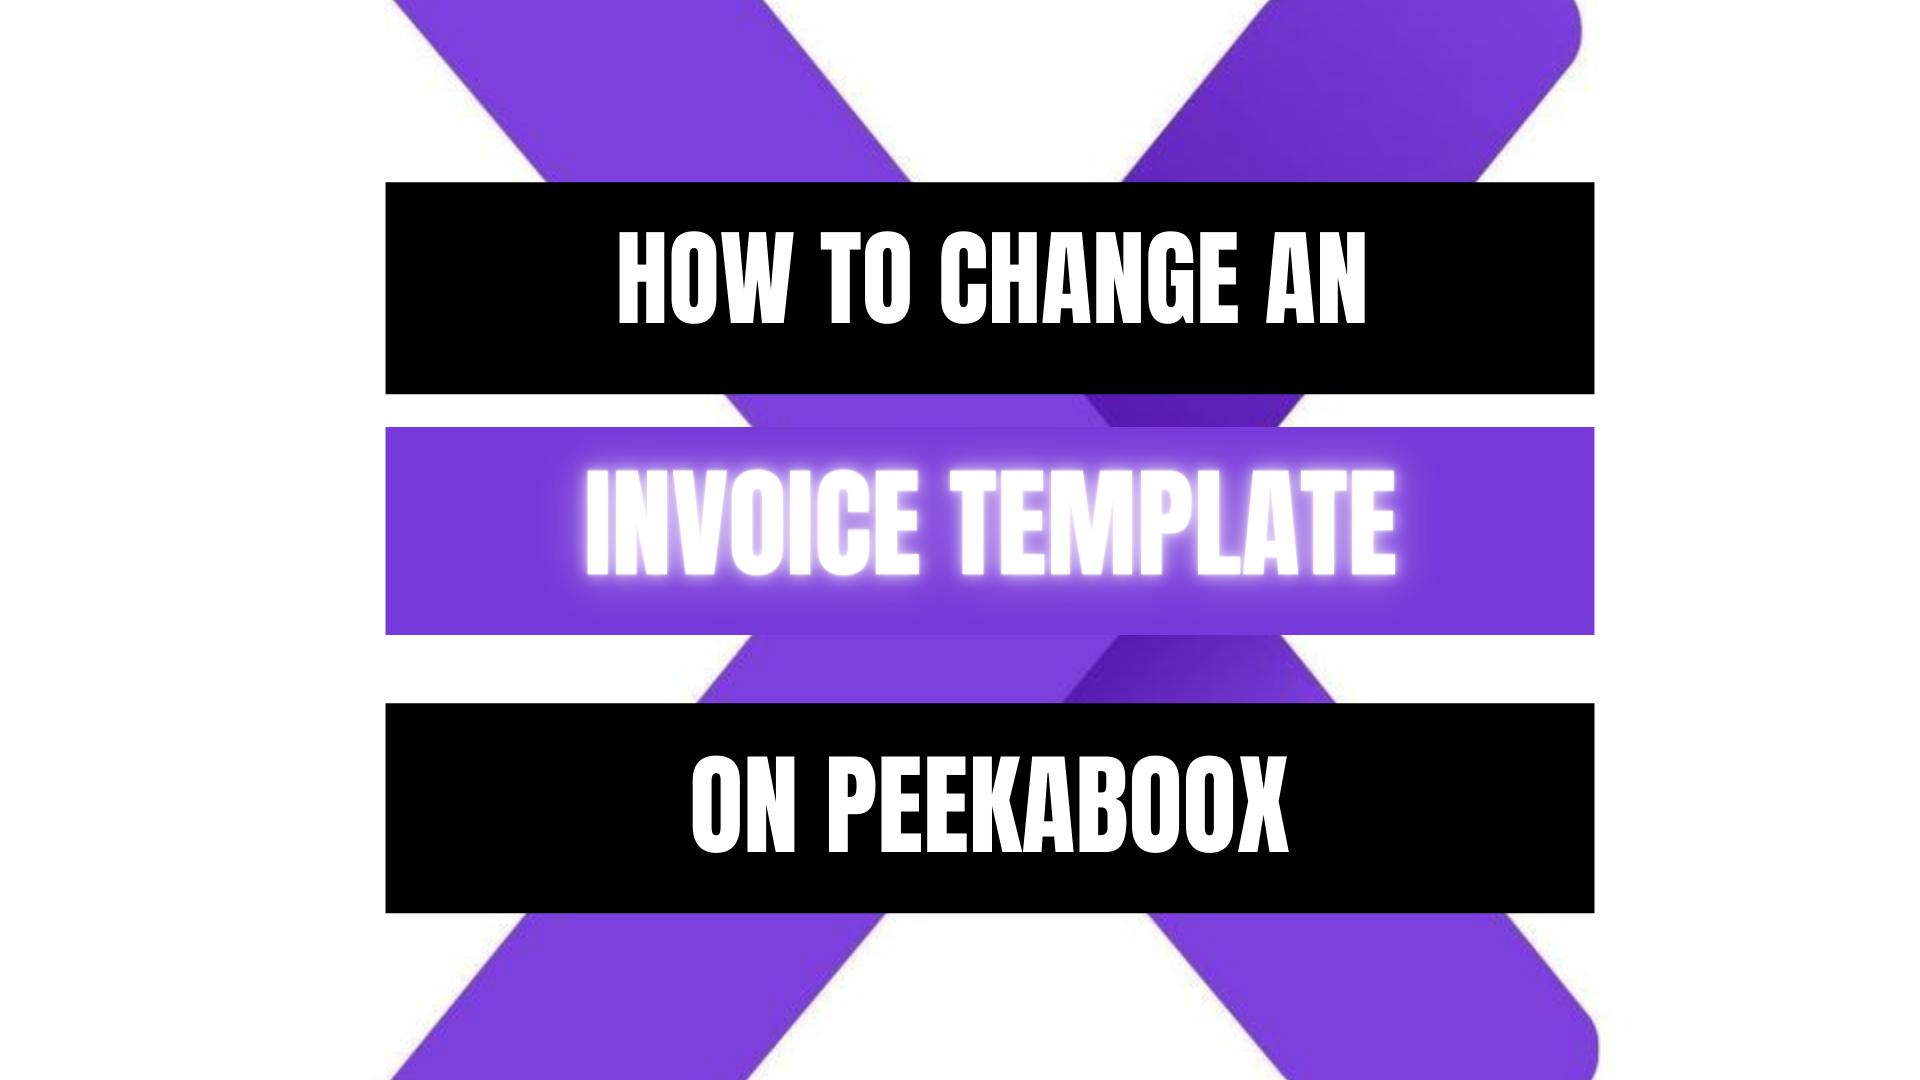 Peekaboox - Change Invoice Template